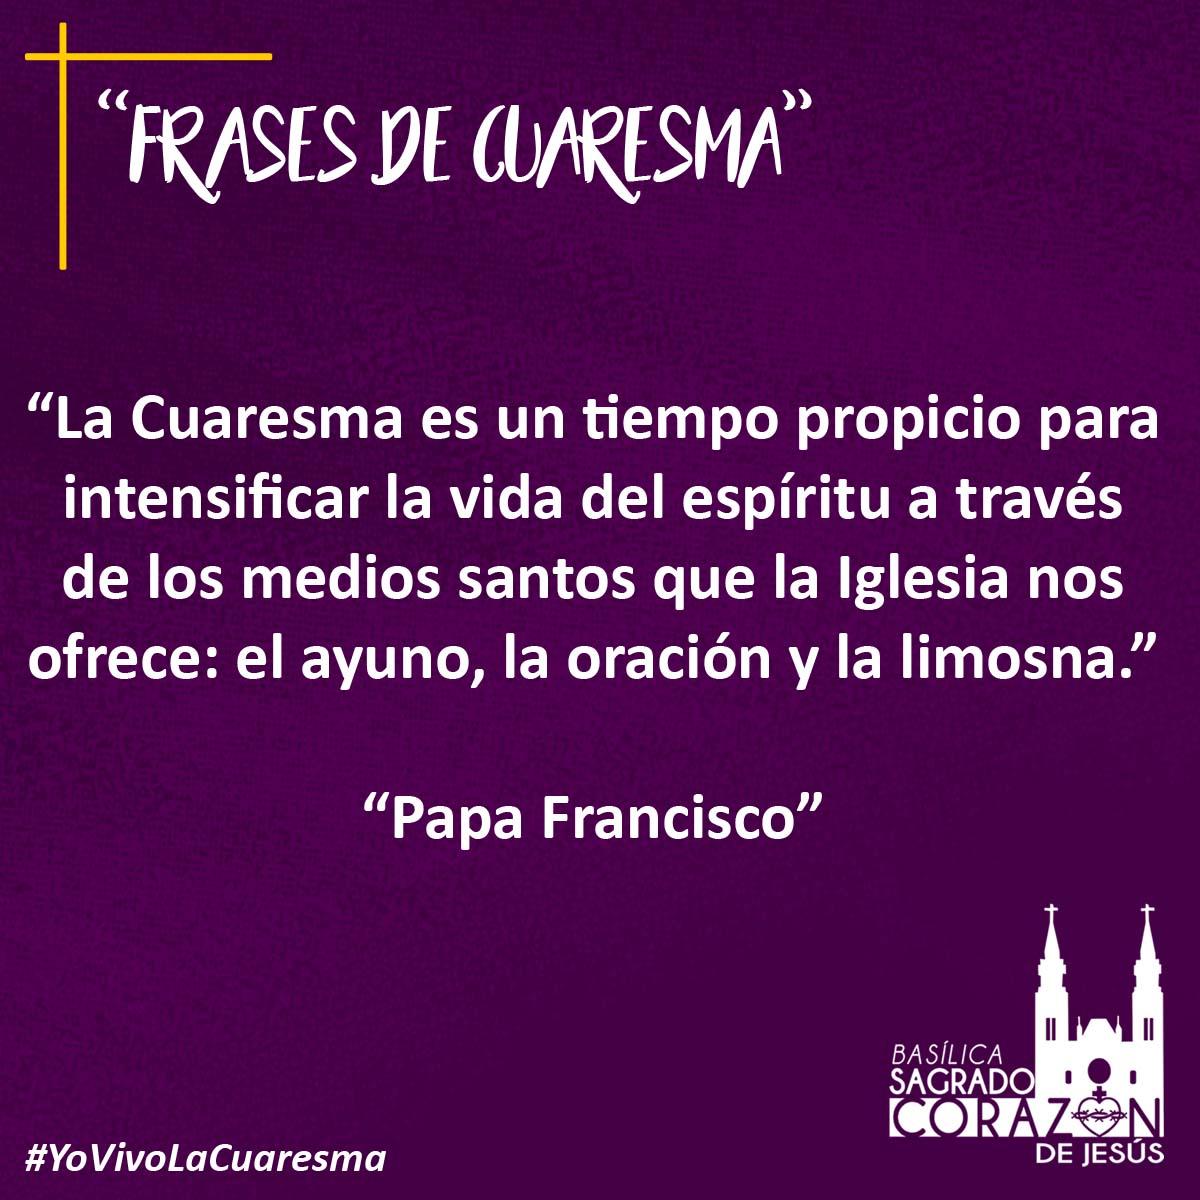 Bsagradocorazon On Twitter Frases De Cuaresma